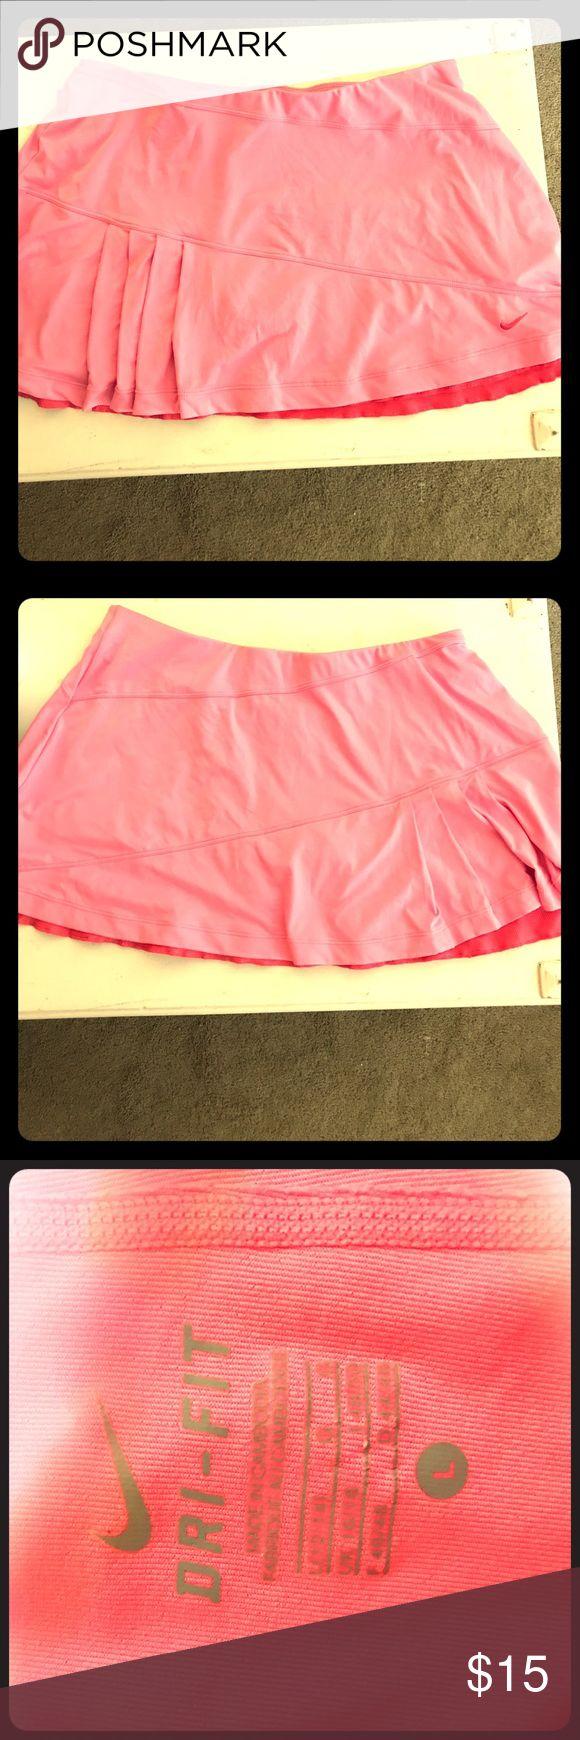 Hot Pink Nike Tennis Skort Nike Women's Dri-fit tennis skort. Worn twice. In perfect condition! Has built in shorts. Nike Skirts